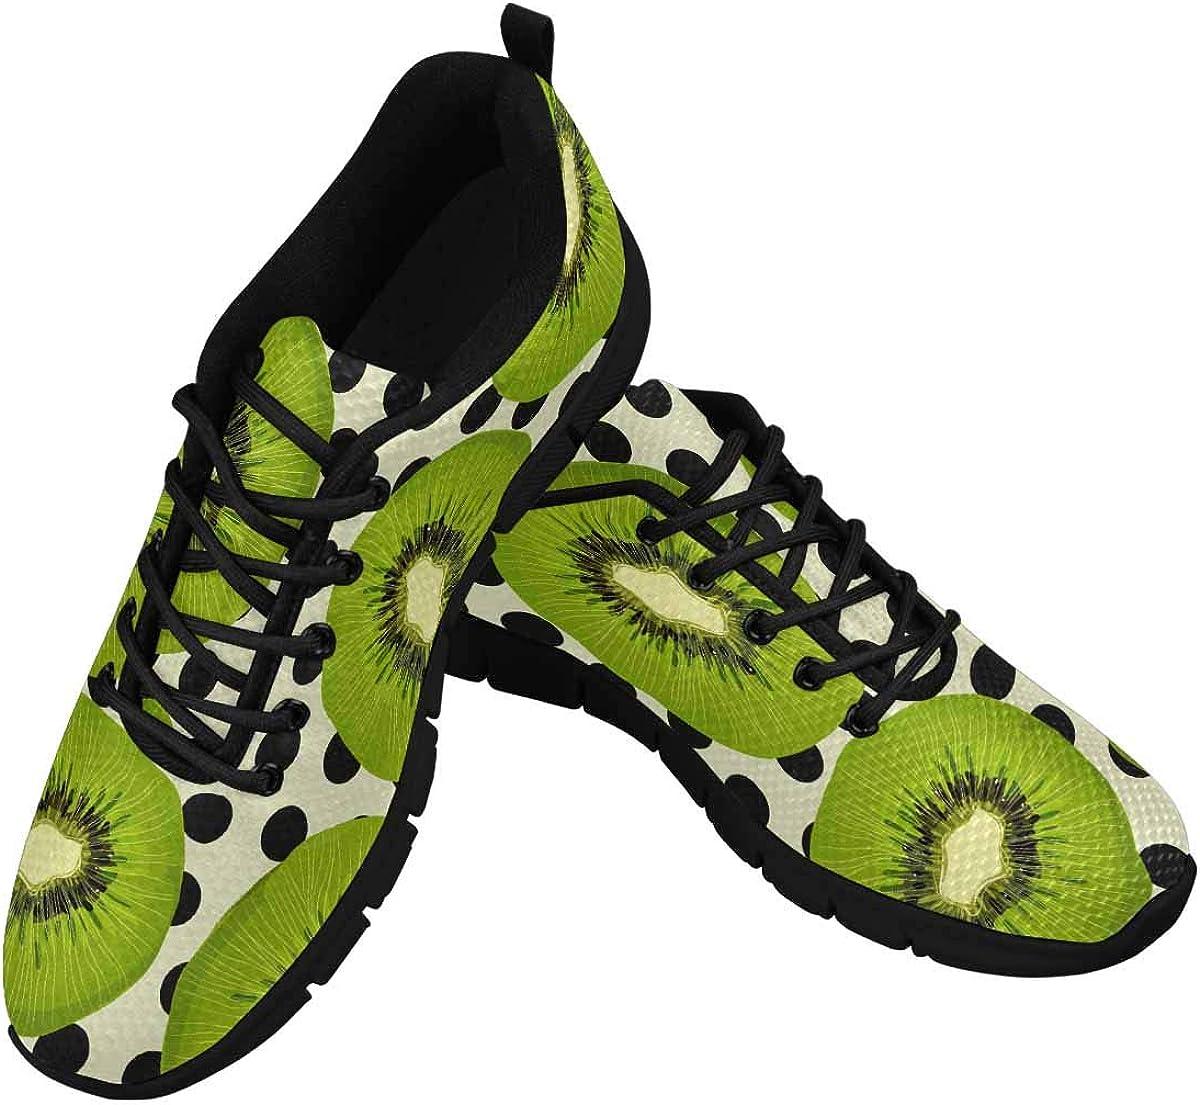 INTERESTPRINT Sunny Tropical and Exotic Fruits Kiwi Women's Athletic Walking Shoes Breathe Comfort Mesh